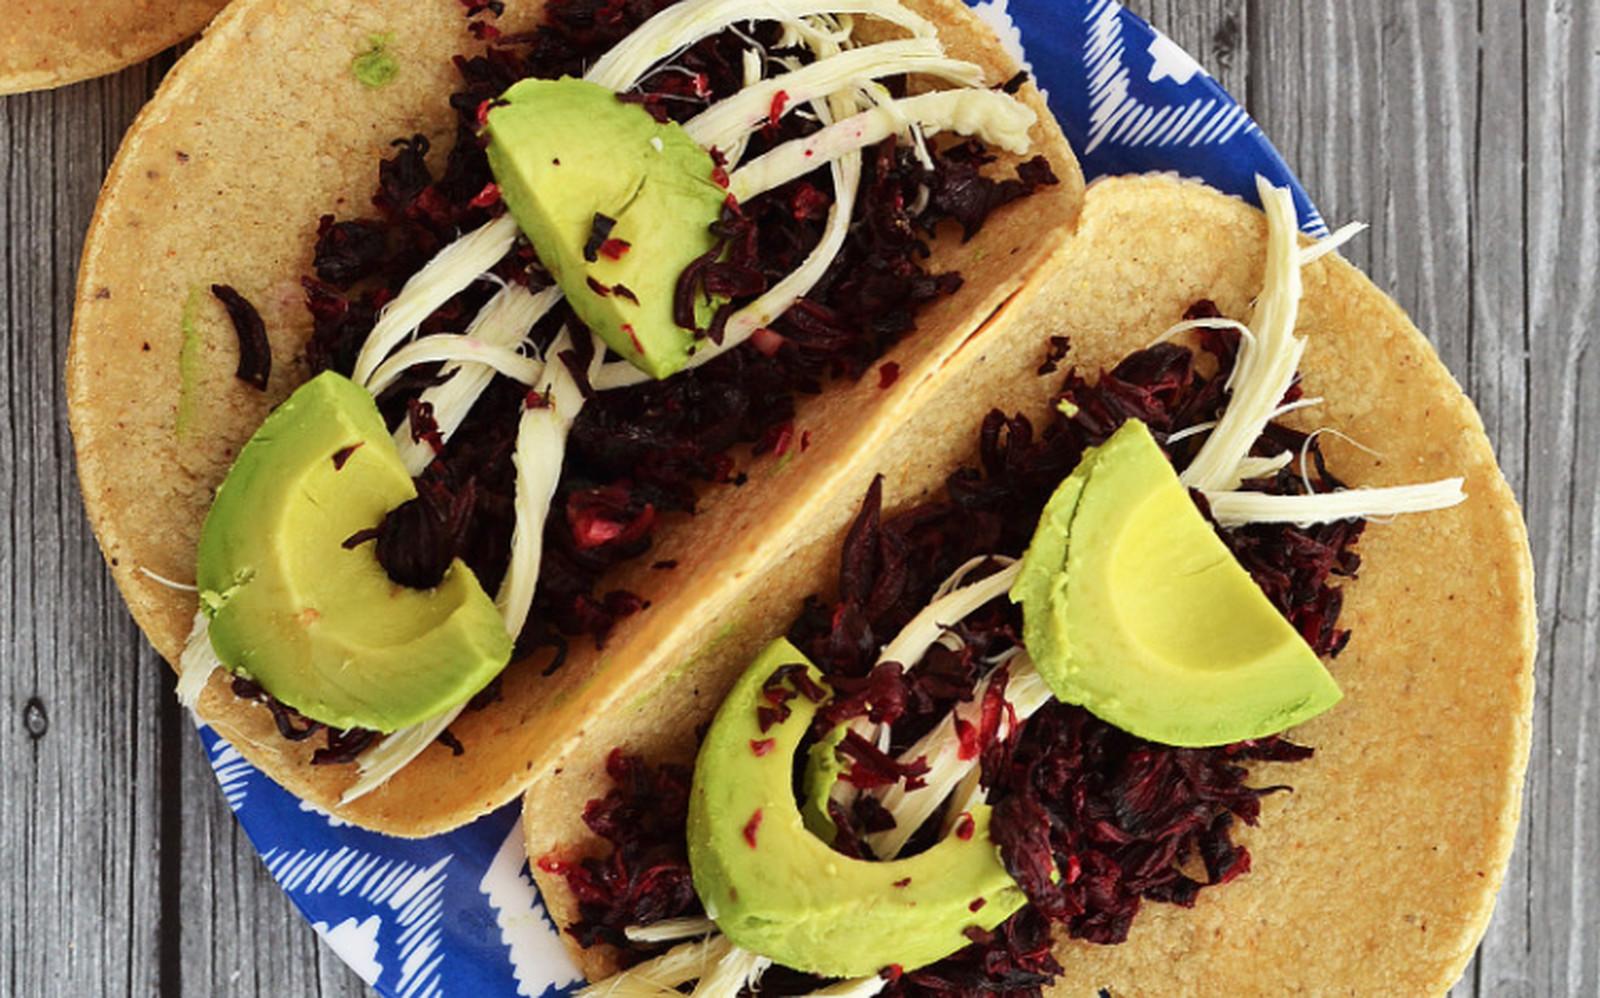 Hibiscus Tacos de Jamaica [Vegan, Gluten-Free]